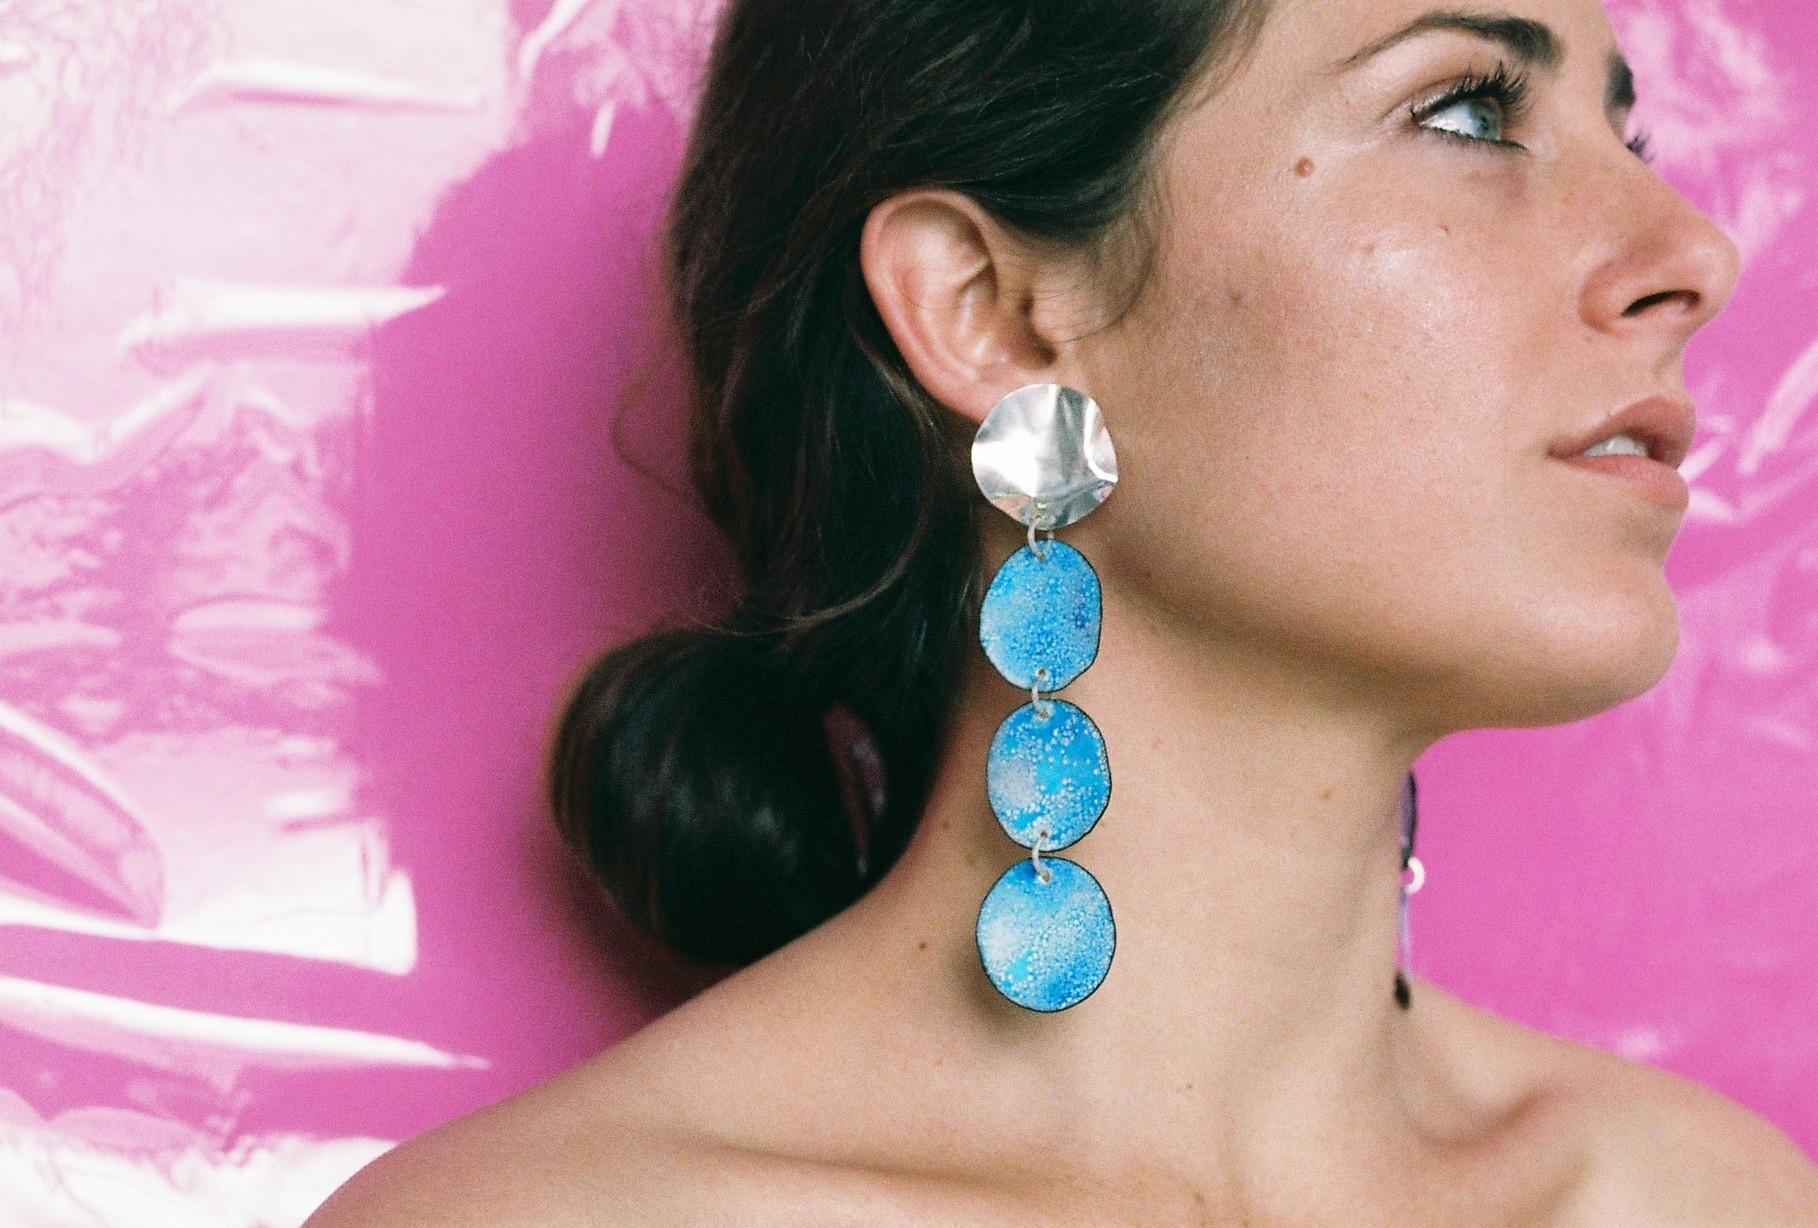 Blue-silver-ada-hodgson-contemporary-australian-jewellery-designer-jeweller-handmade-mebourne-made-custom-colourful-enamel-silver-gold-statement-ring-earrings-handcrafted-unique-bespoke